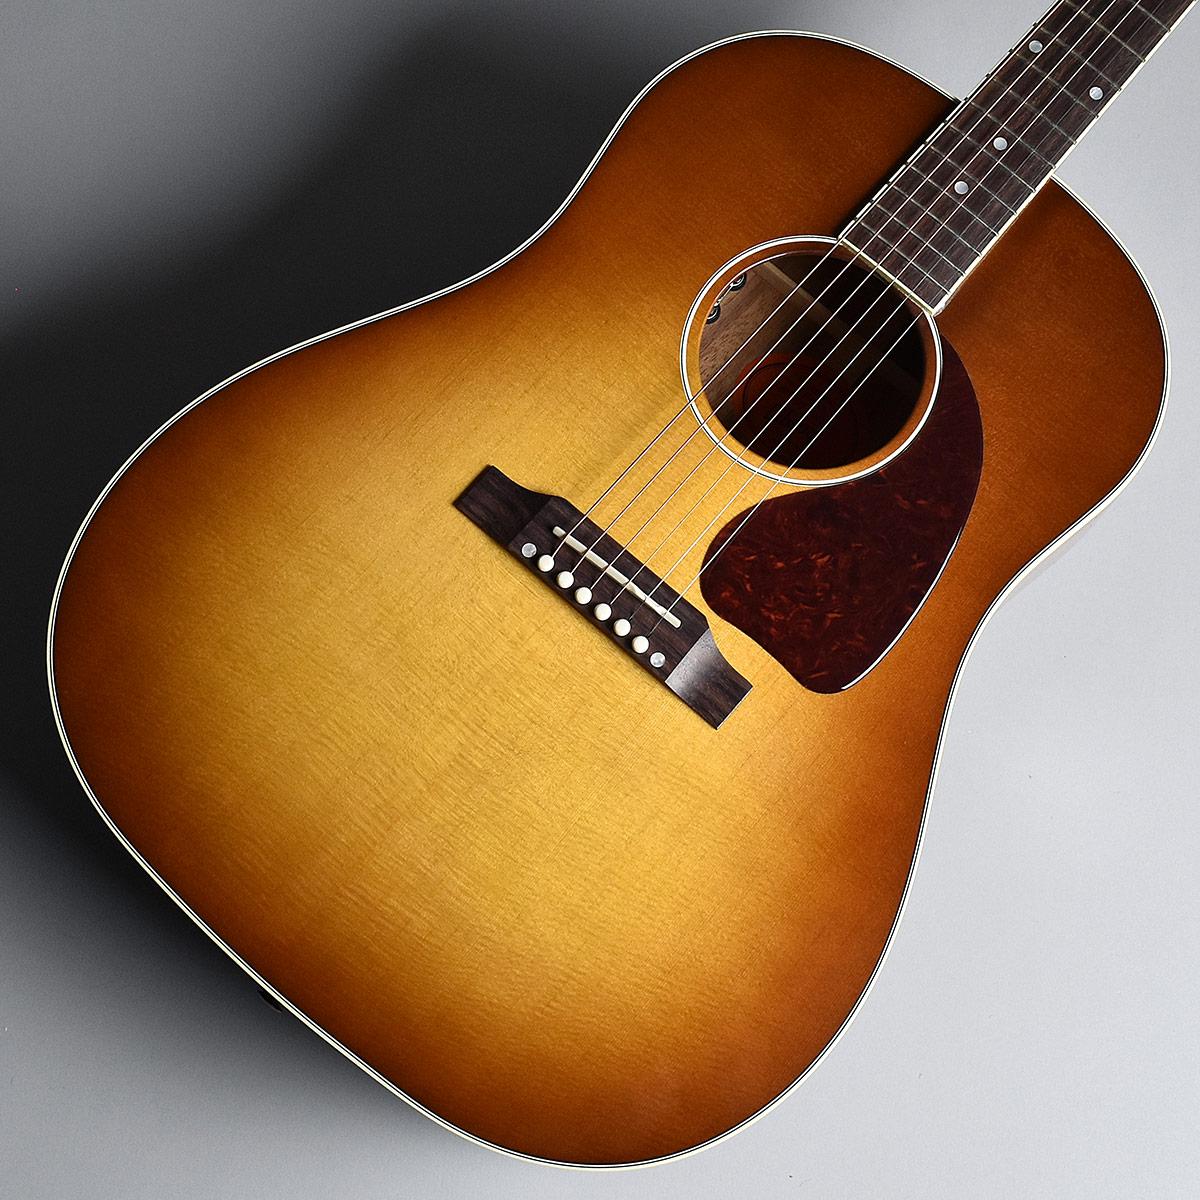 Gibson J-45 Koa Honey Burst 2017 Limited Model S/N:11107050 エレアコ 【ギブソン J45 Koa】【未展示品】